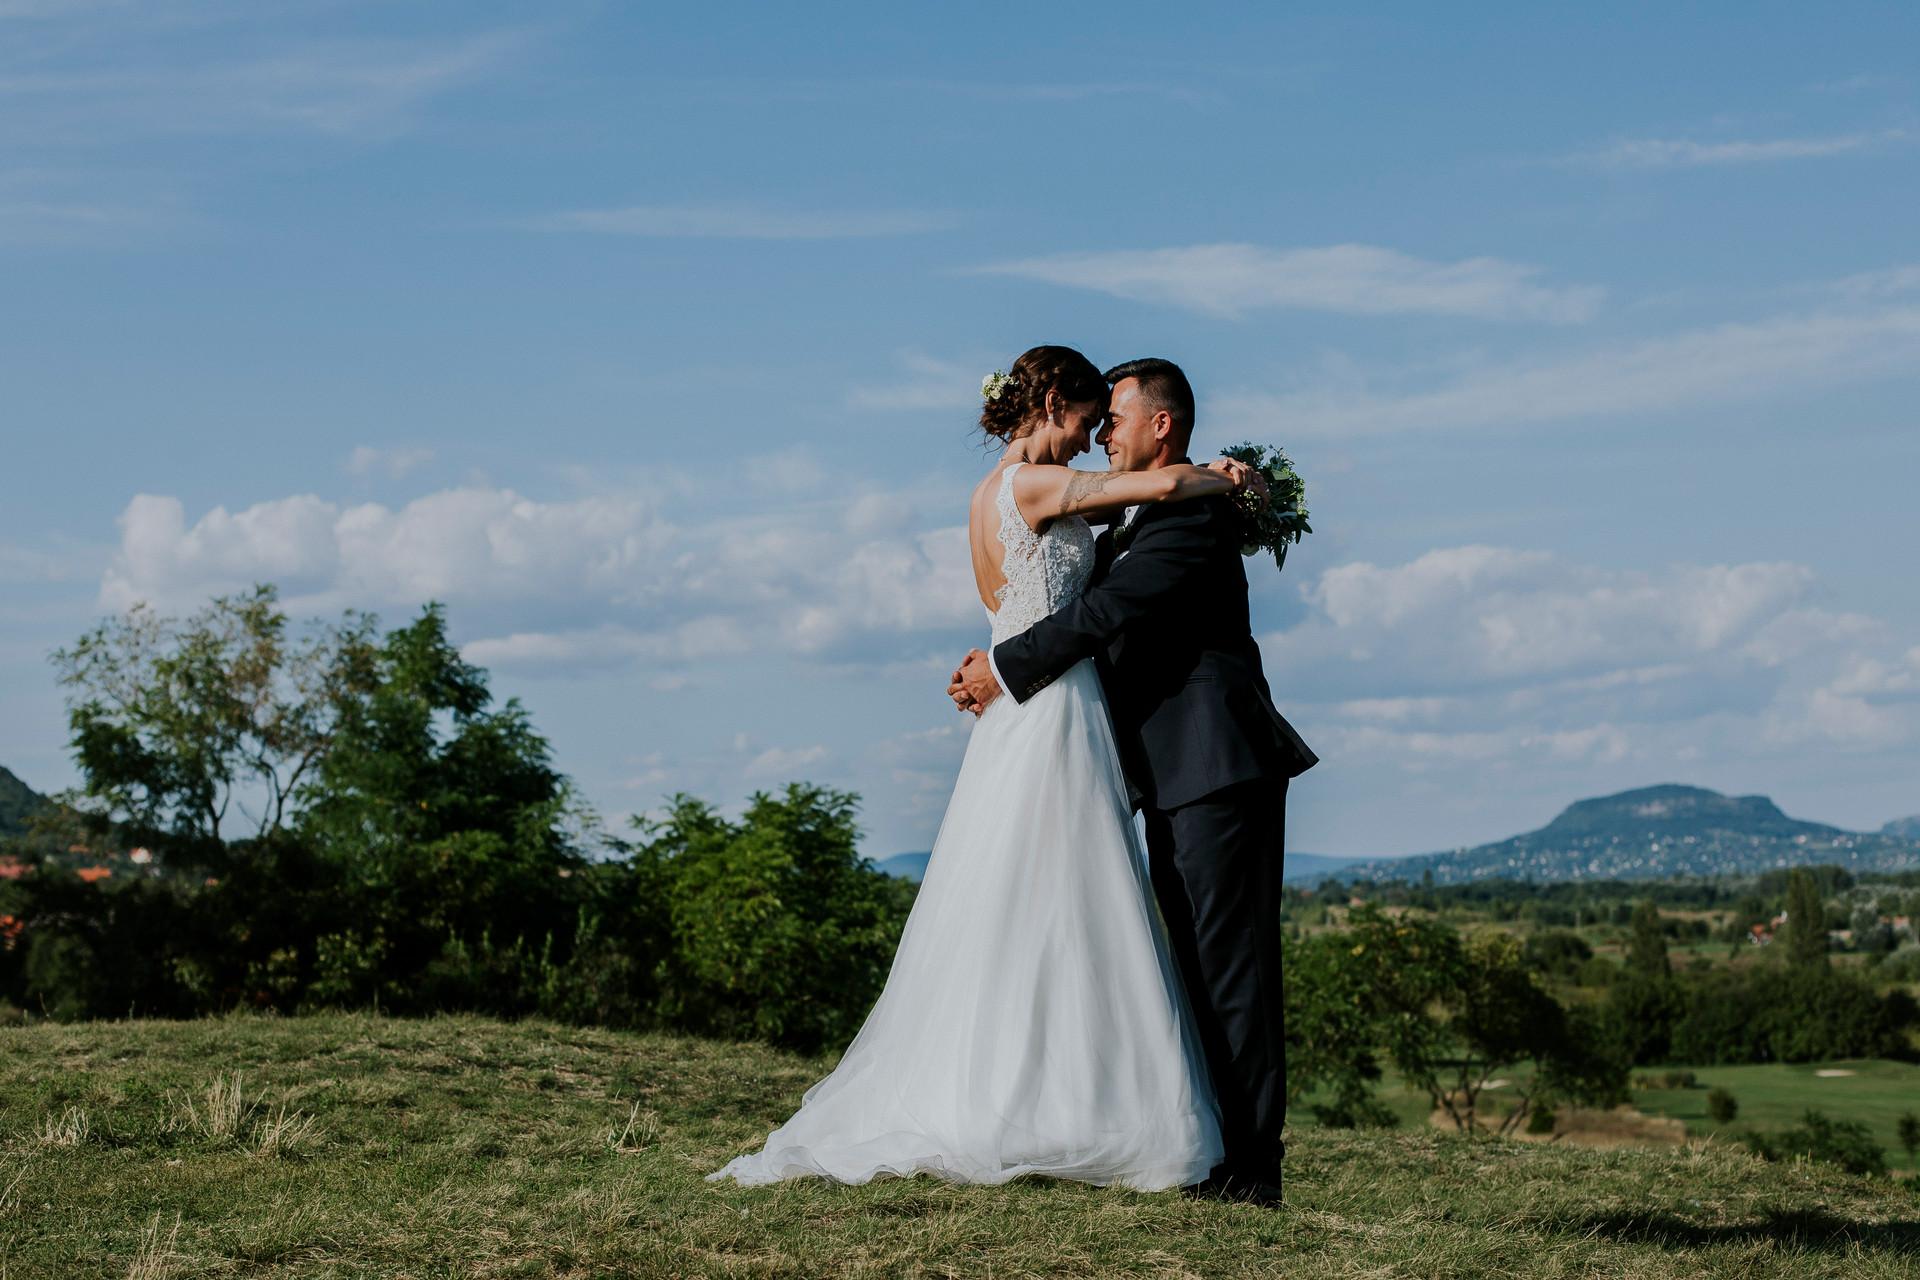 Hungary wedding 4.JPG